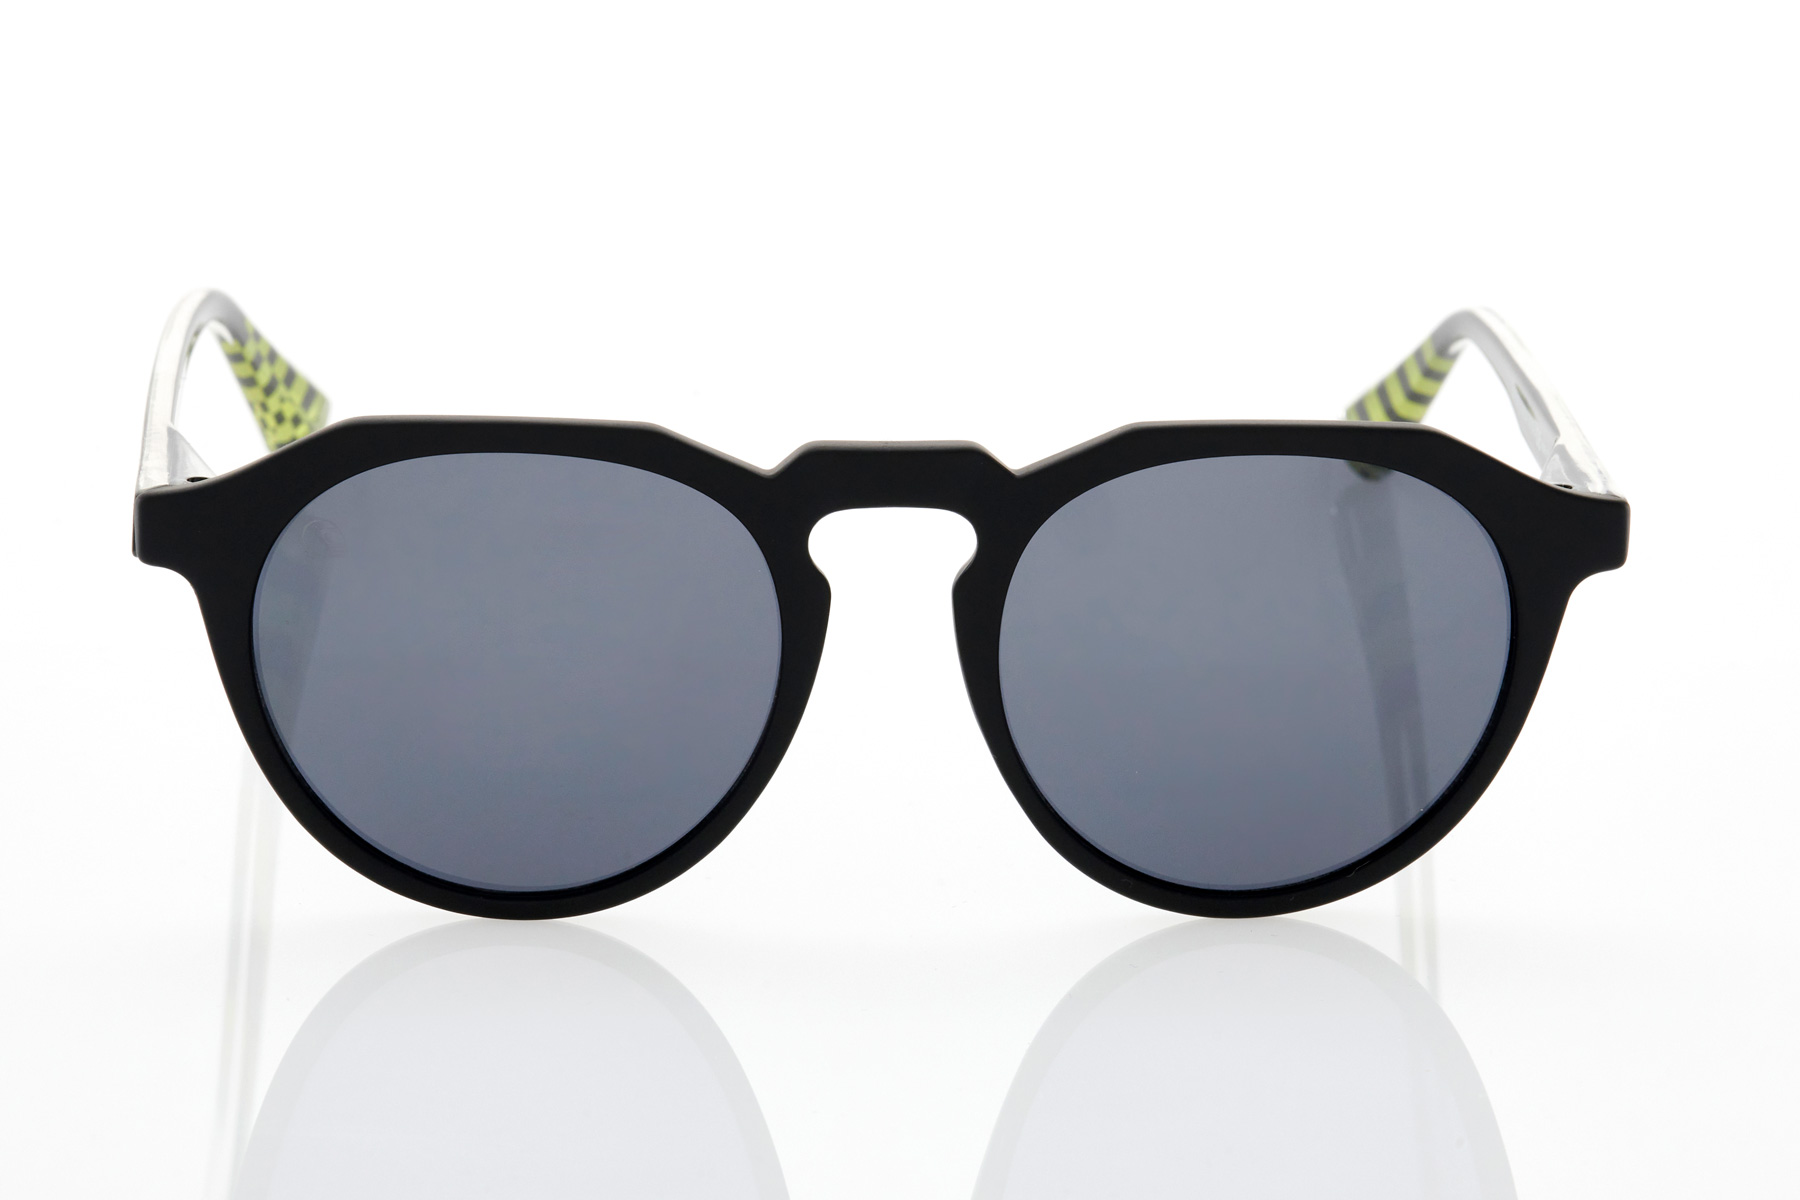 Male Black Sunglasses Hawkers VR46 RIDERS ACADEMY WARWICK